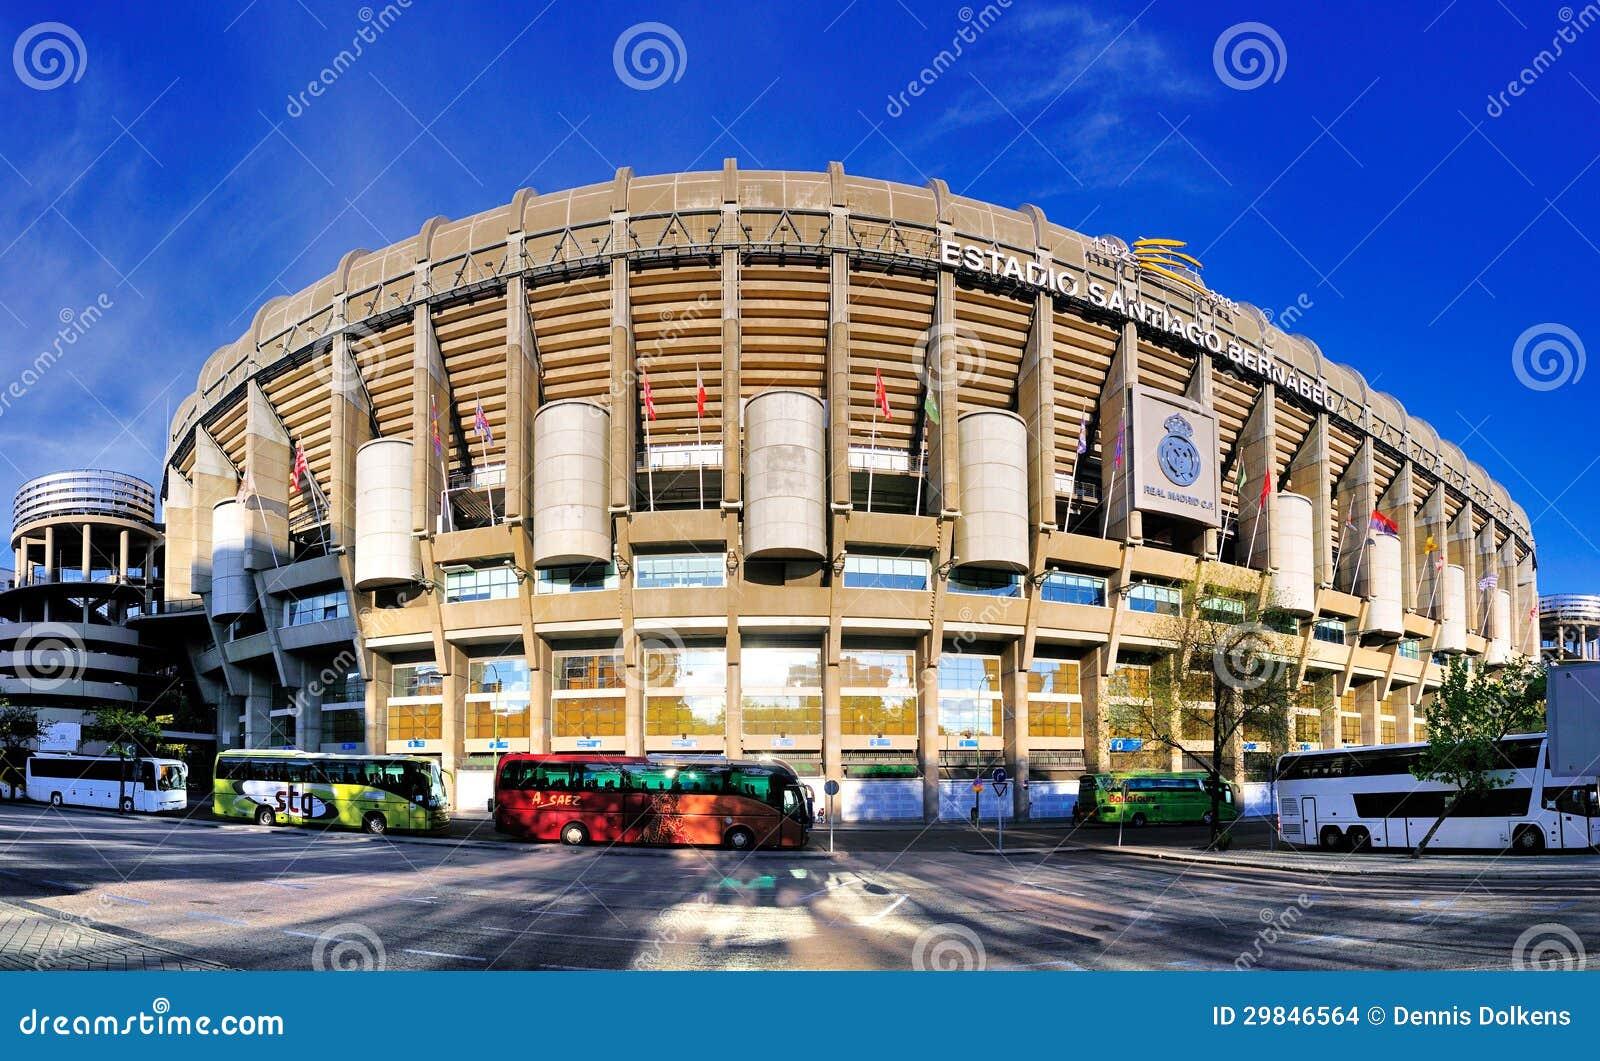 Stadium of real madrid spain editorial stock image for Estadio arena